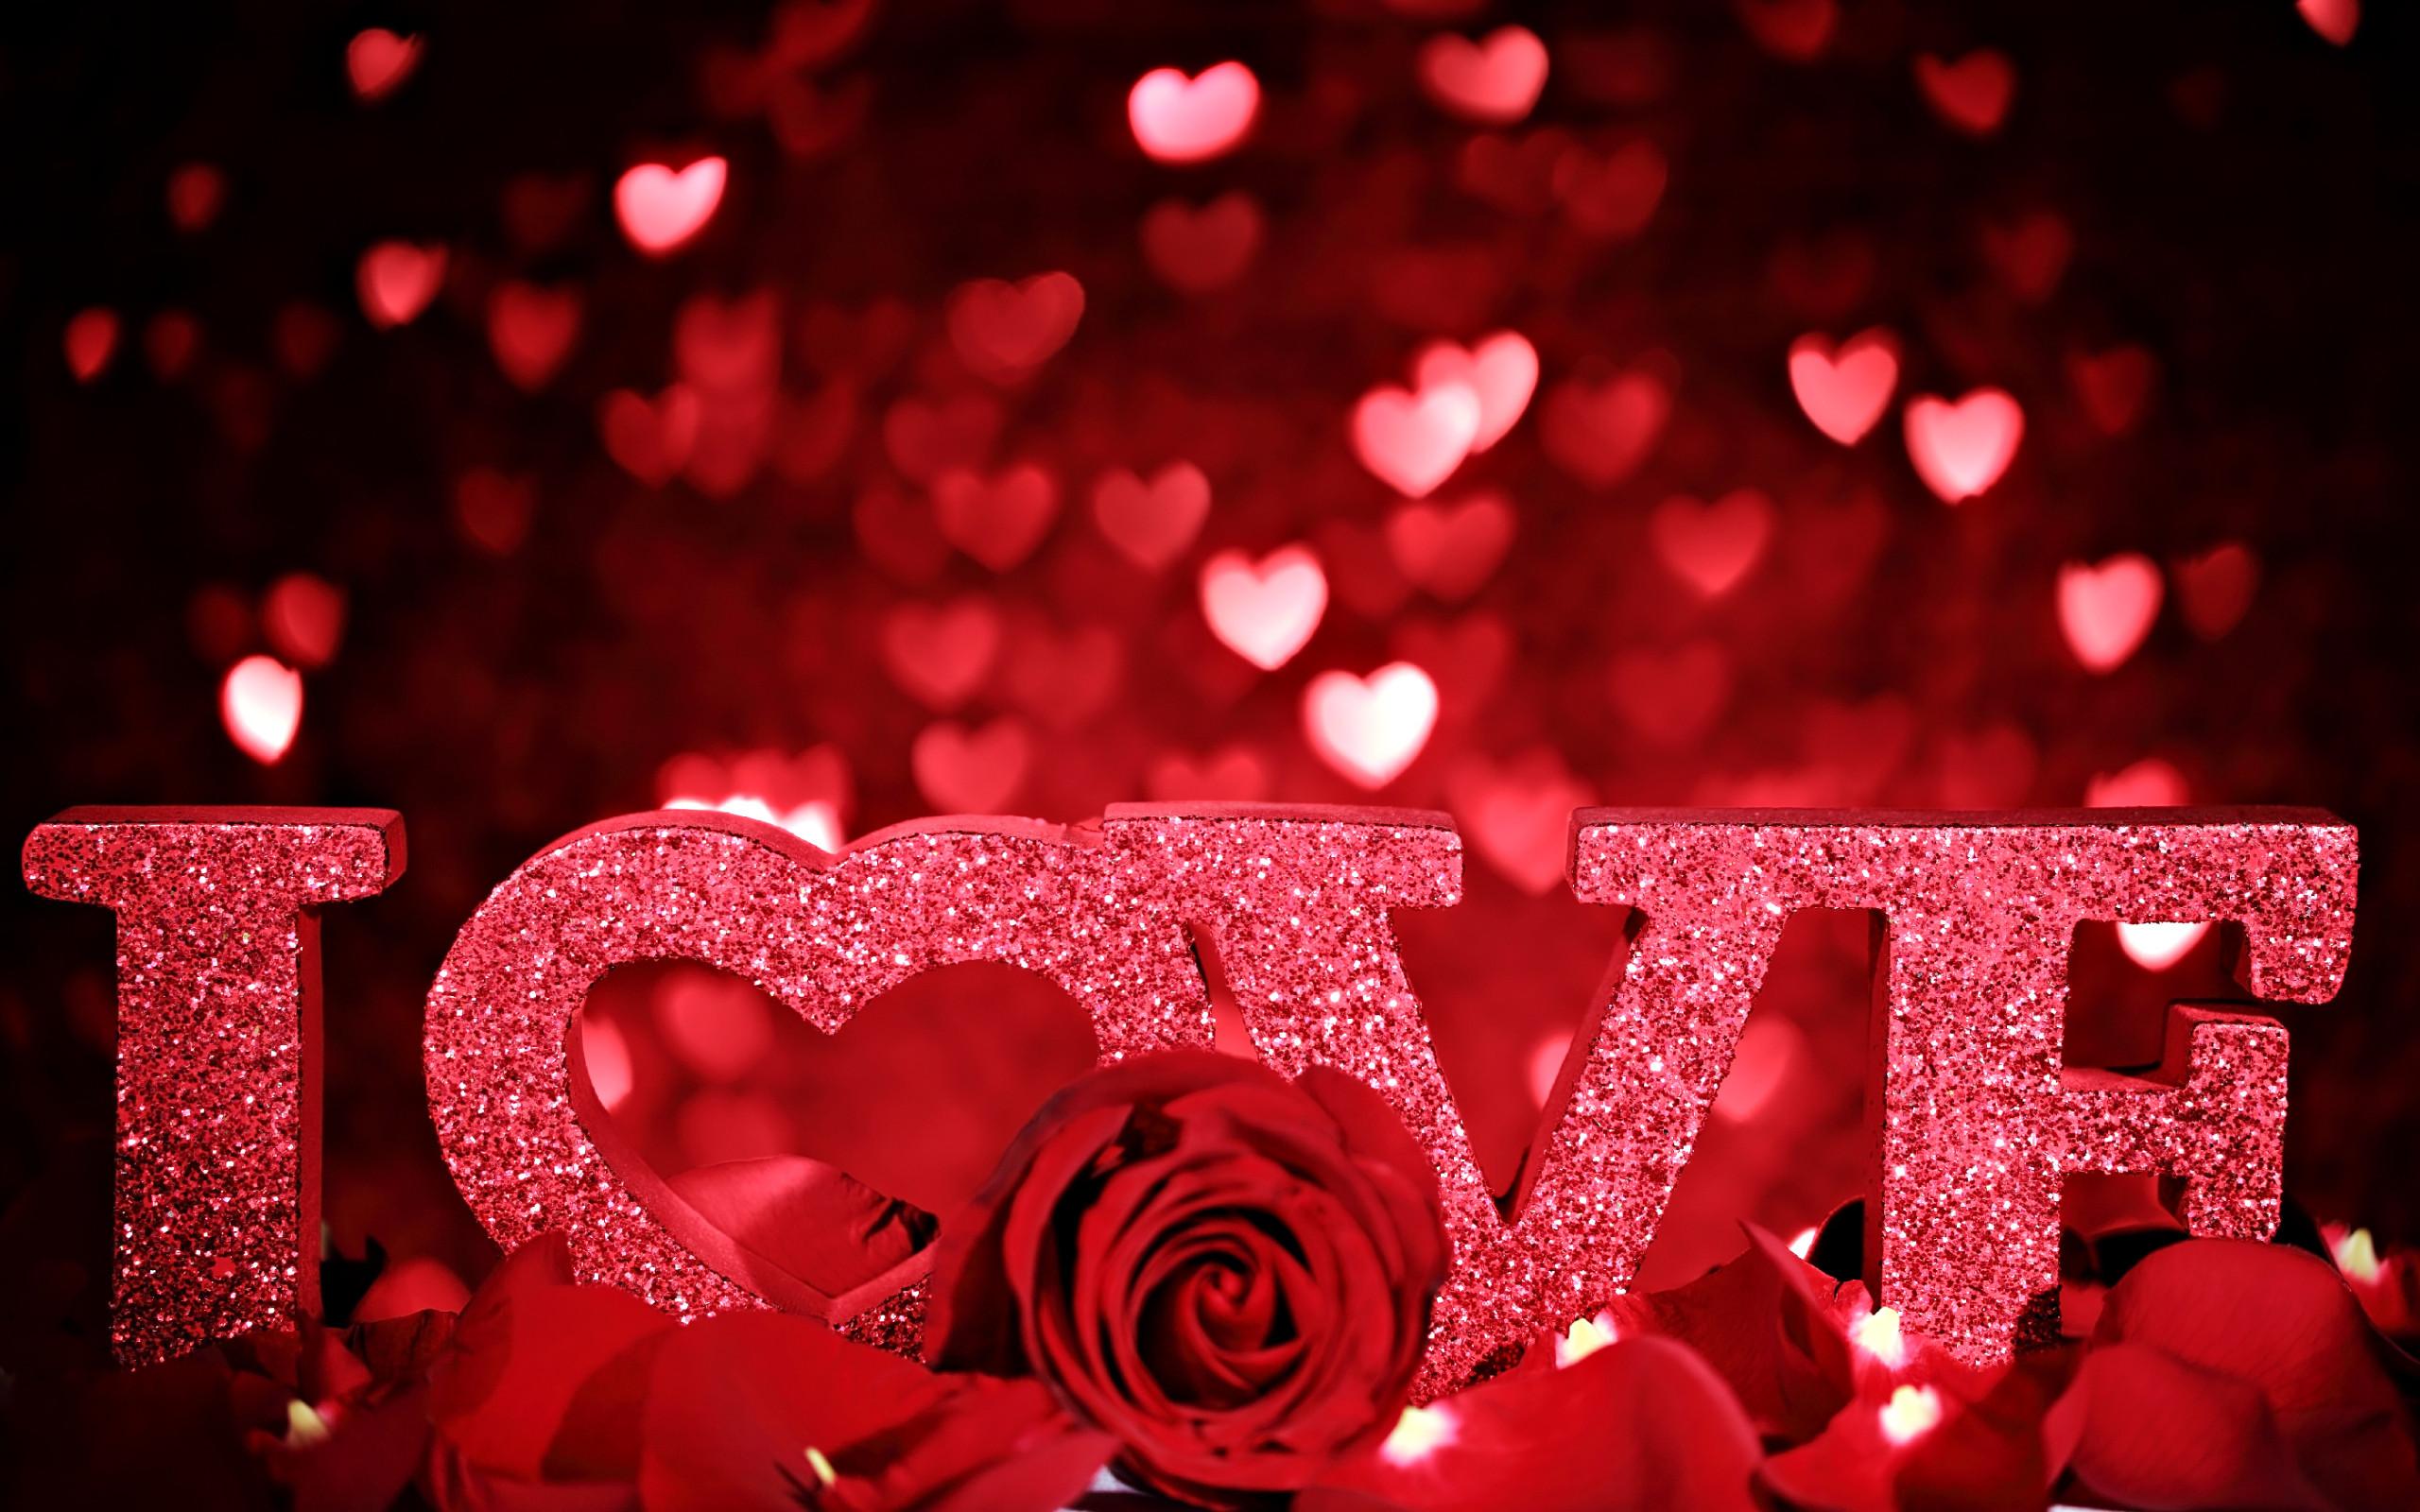 Red Rose Flowers Wallpaper Images Desktop Widescreen Backgrounds